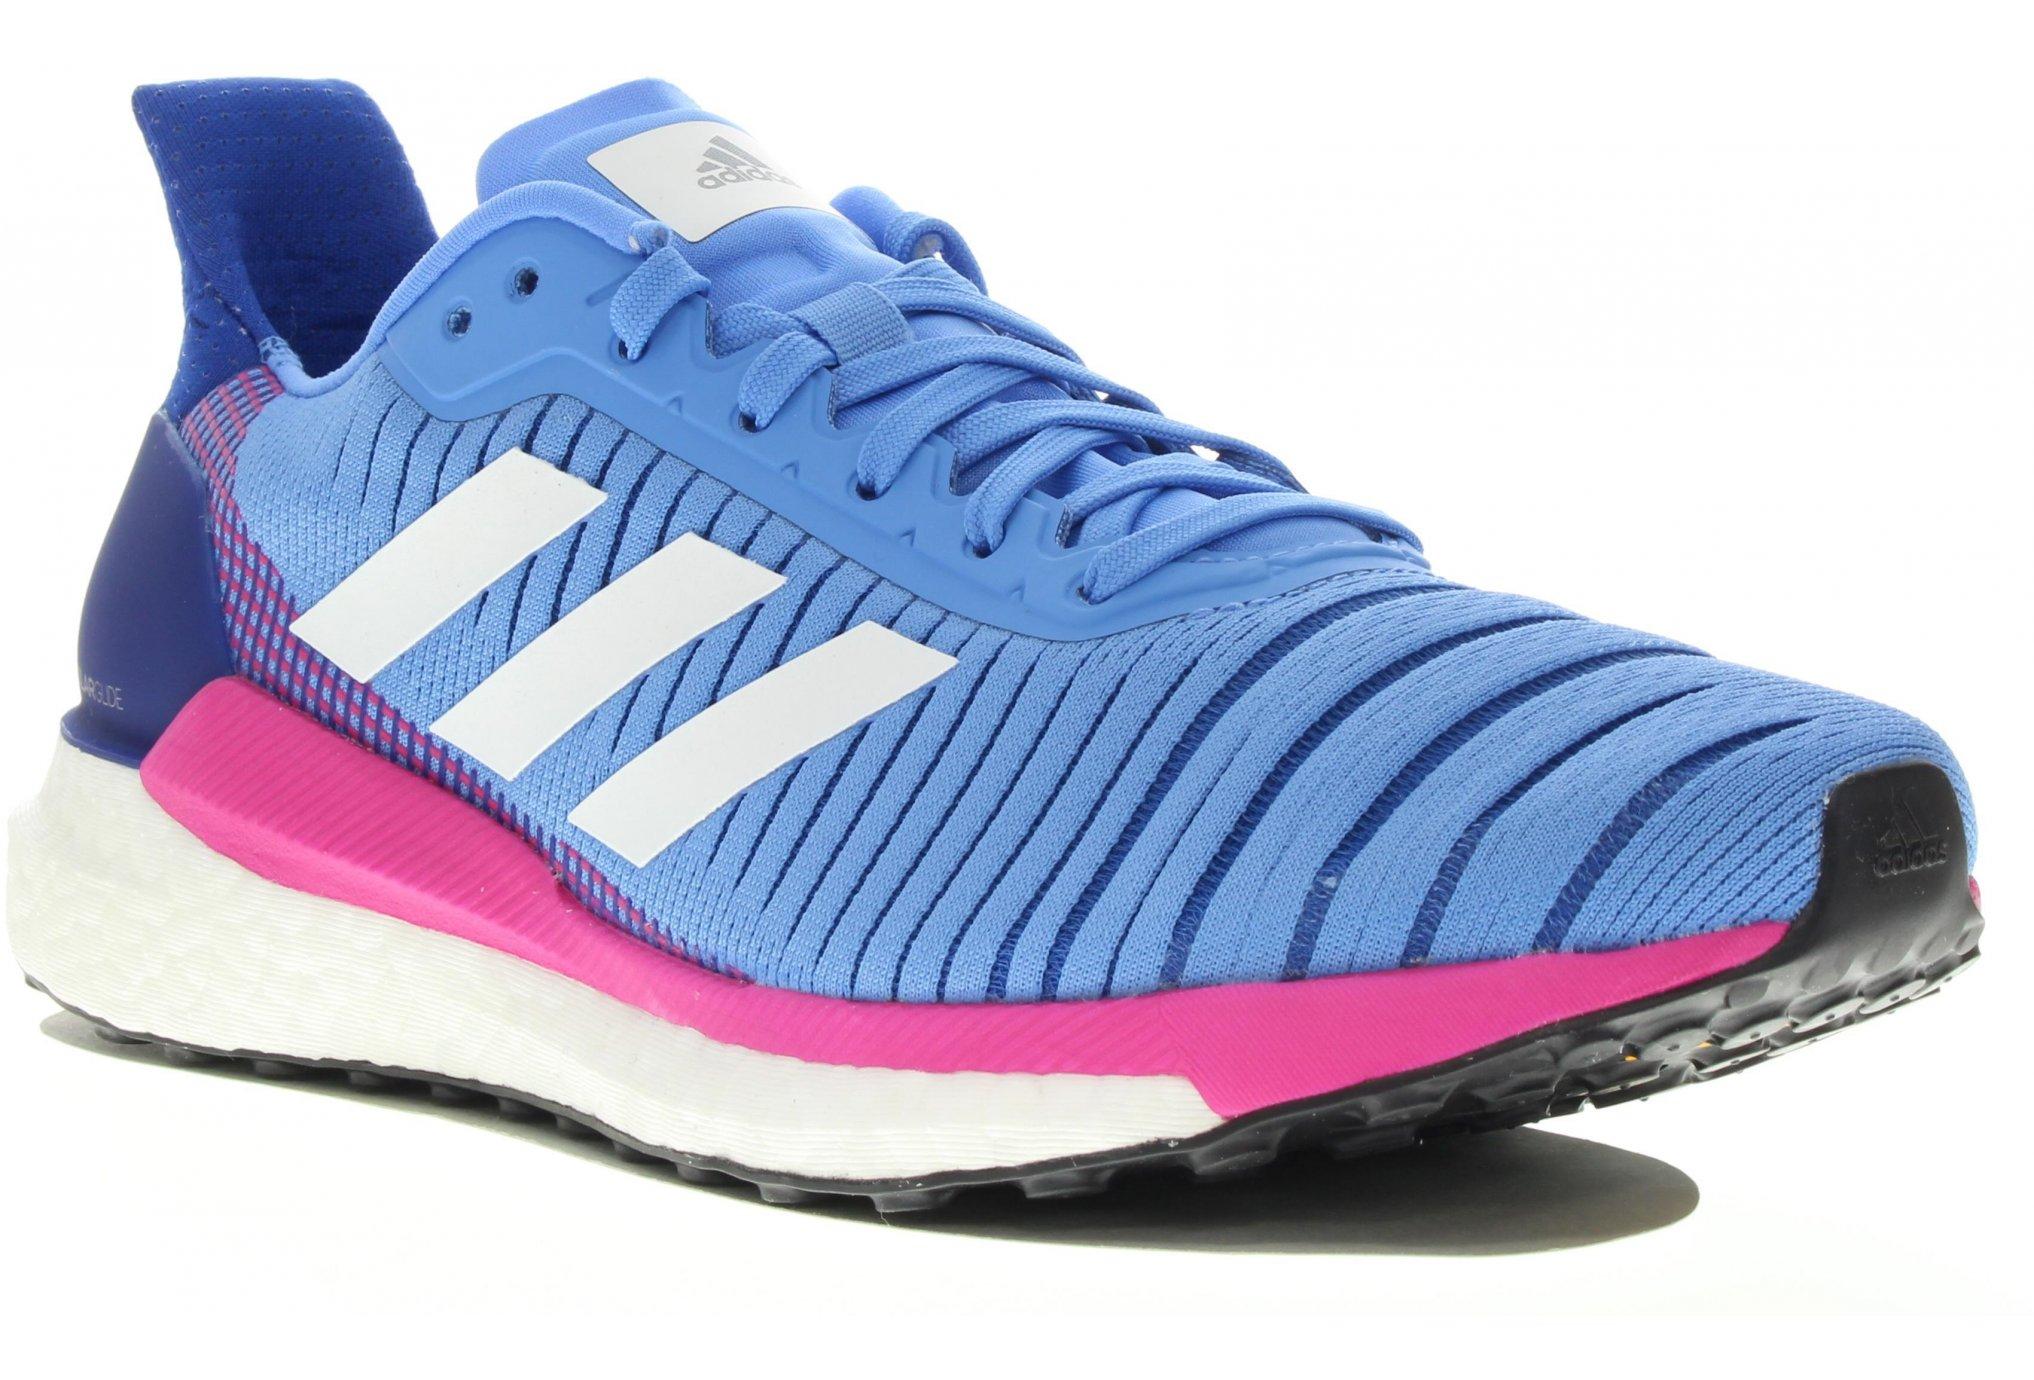 adidas Solar Glide 19 Chaussures running femme